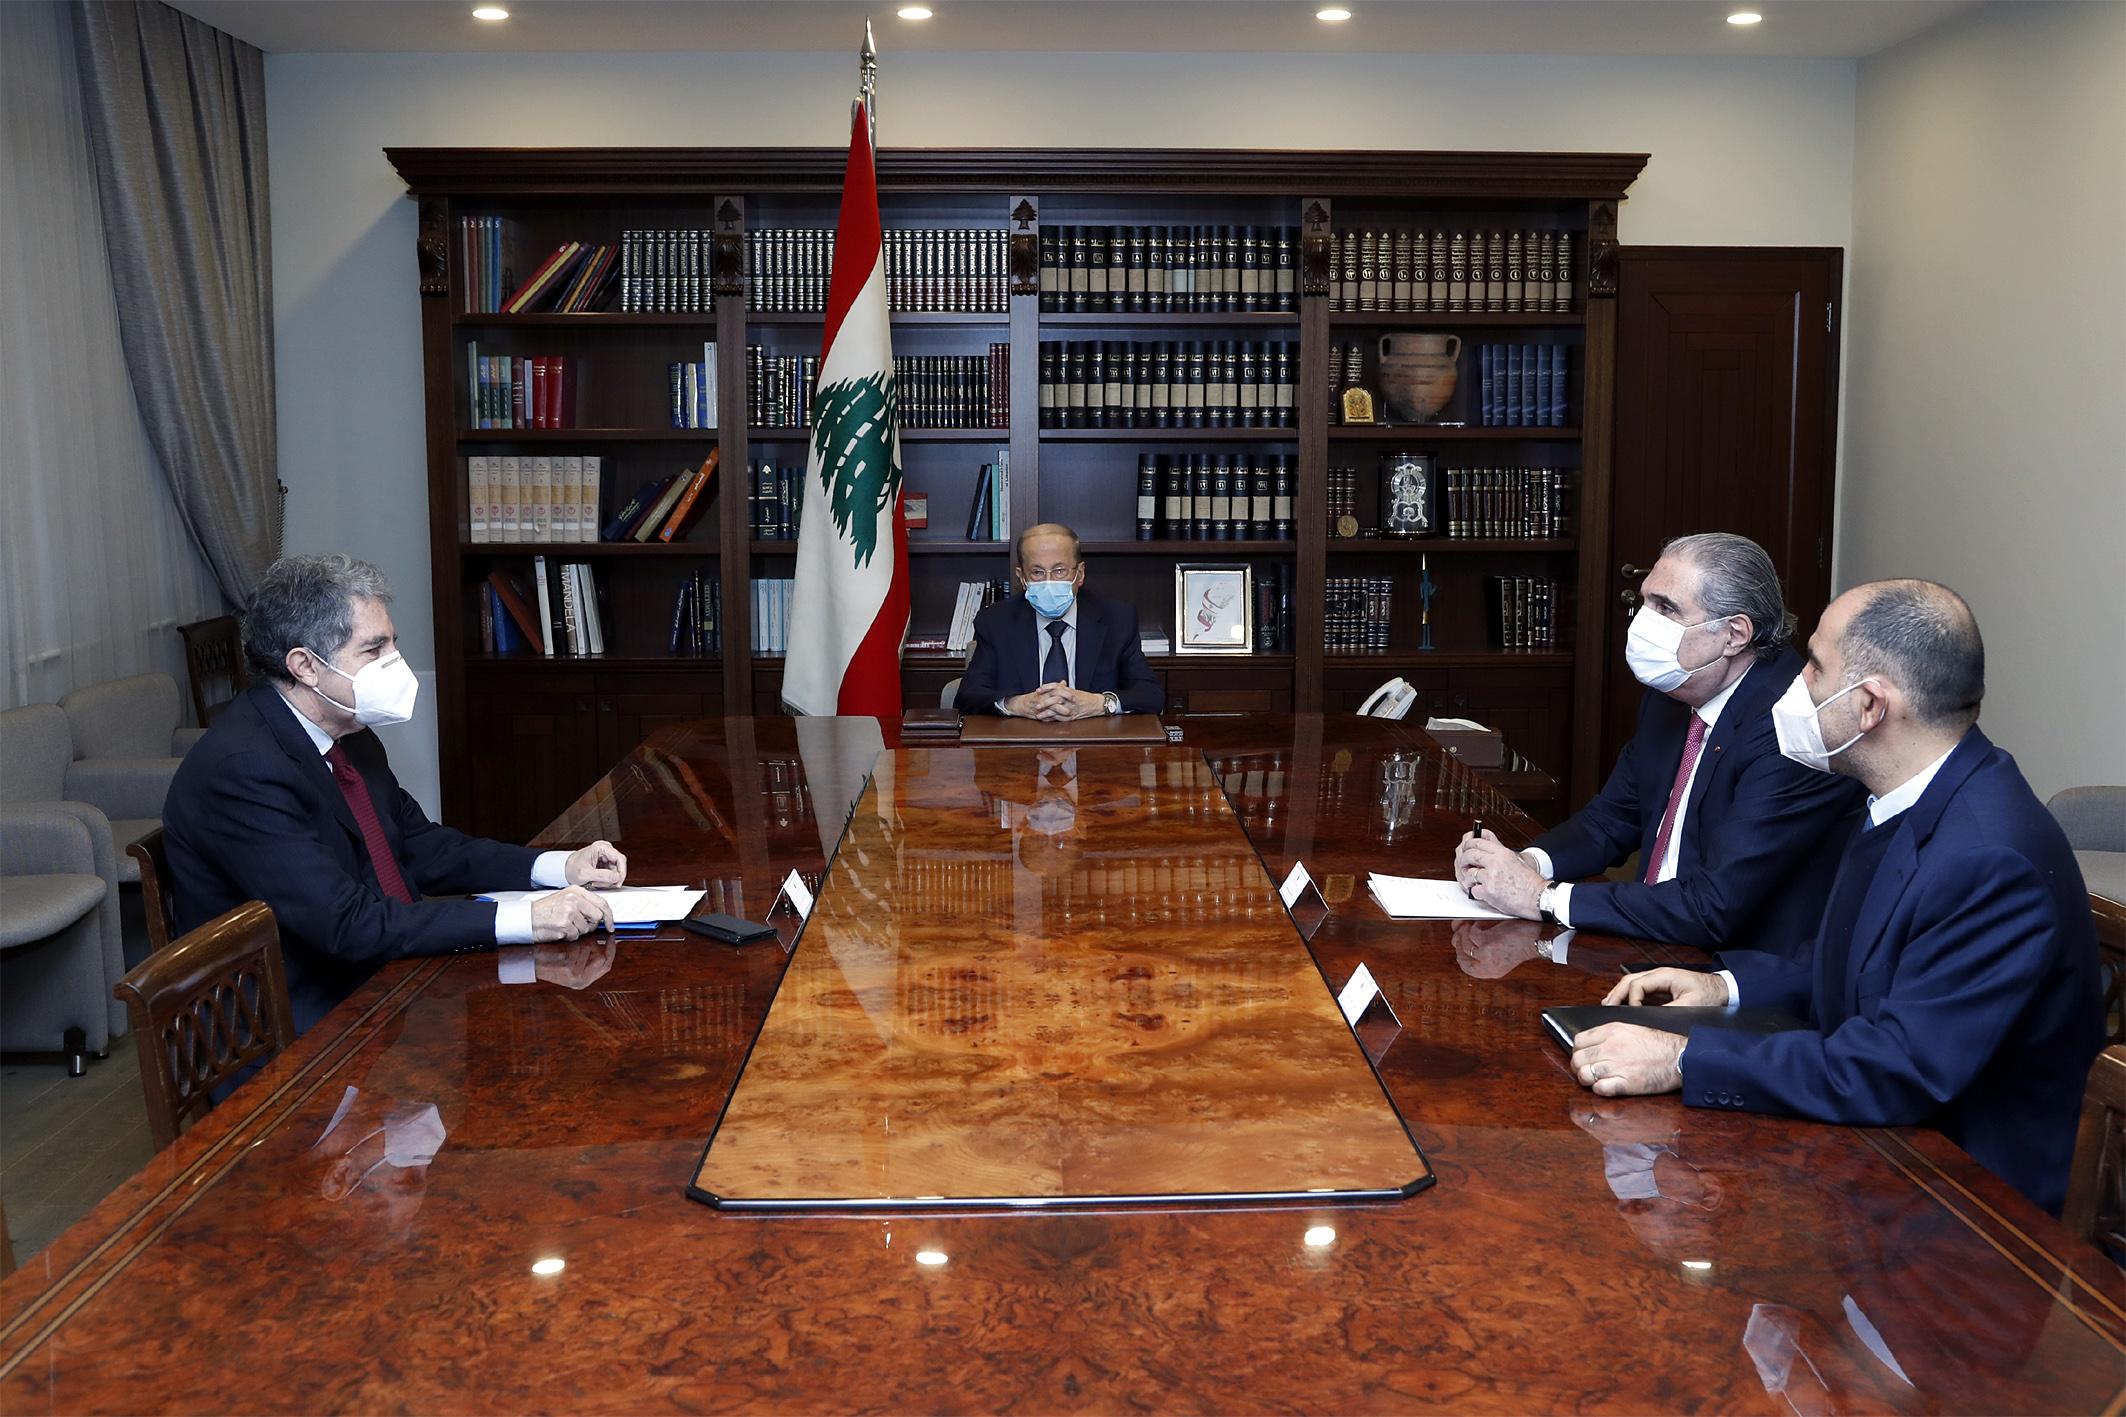 02 -Minister Ghazi Wazni